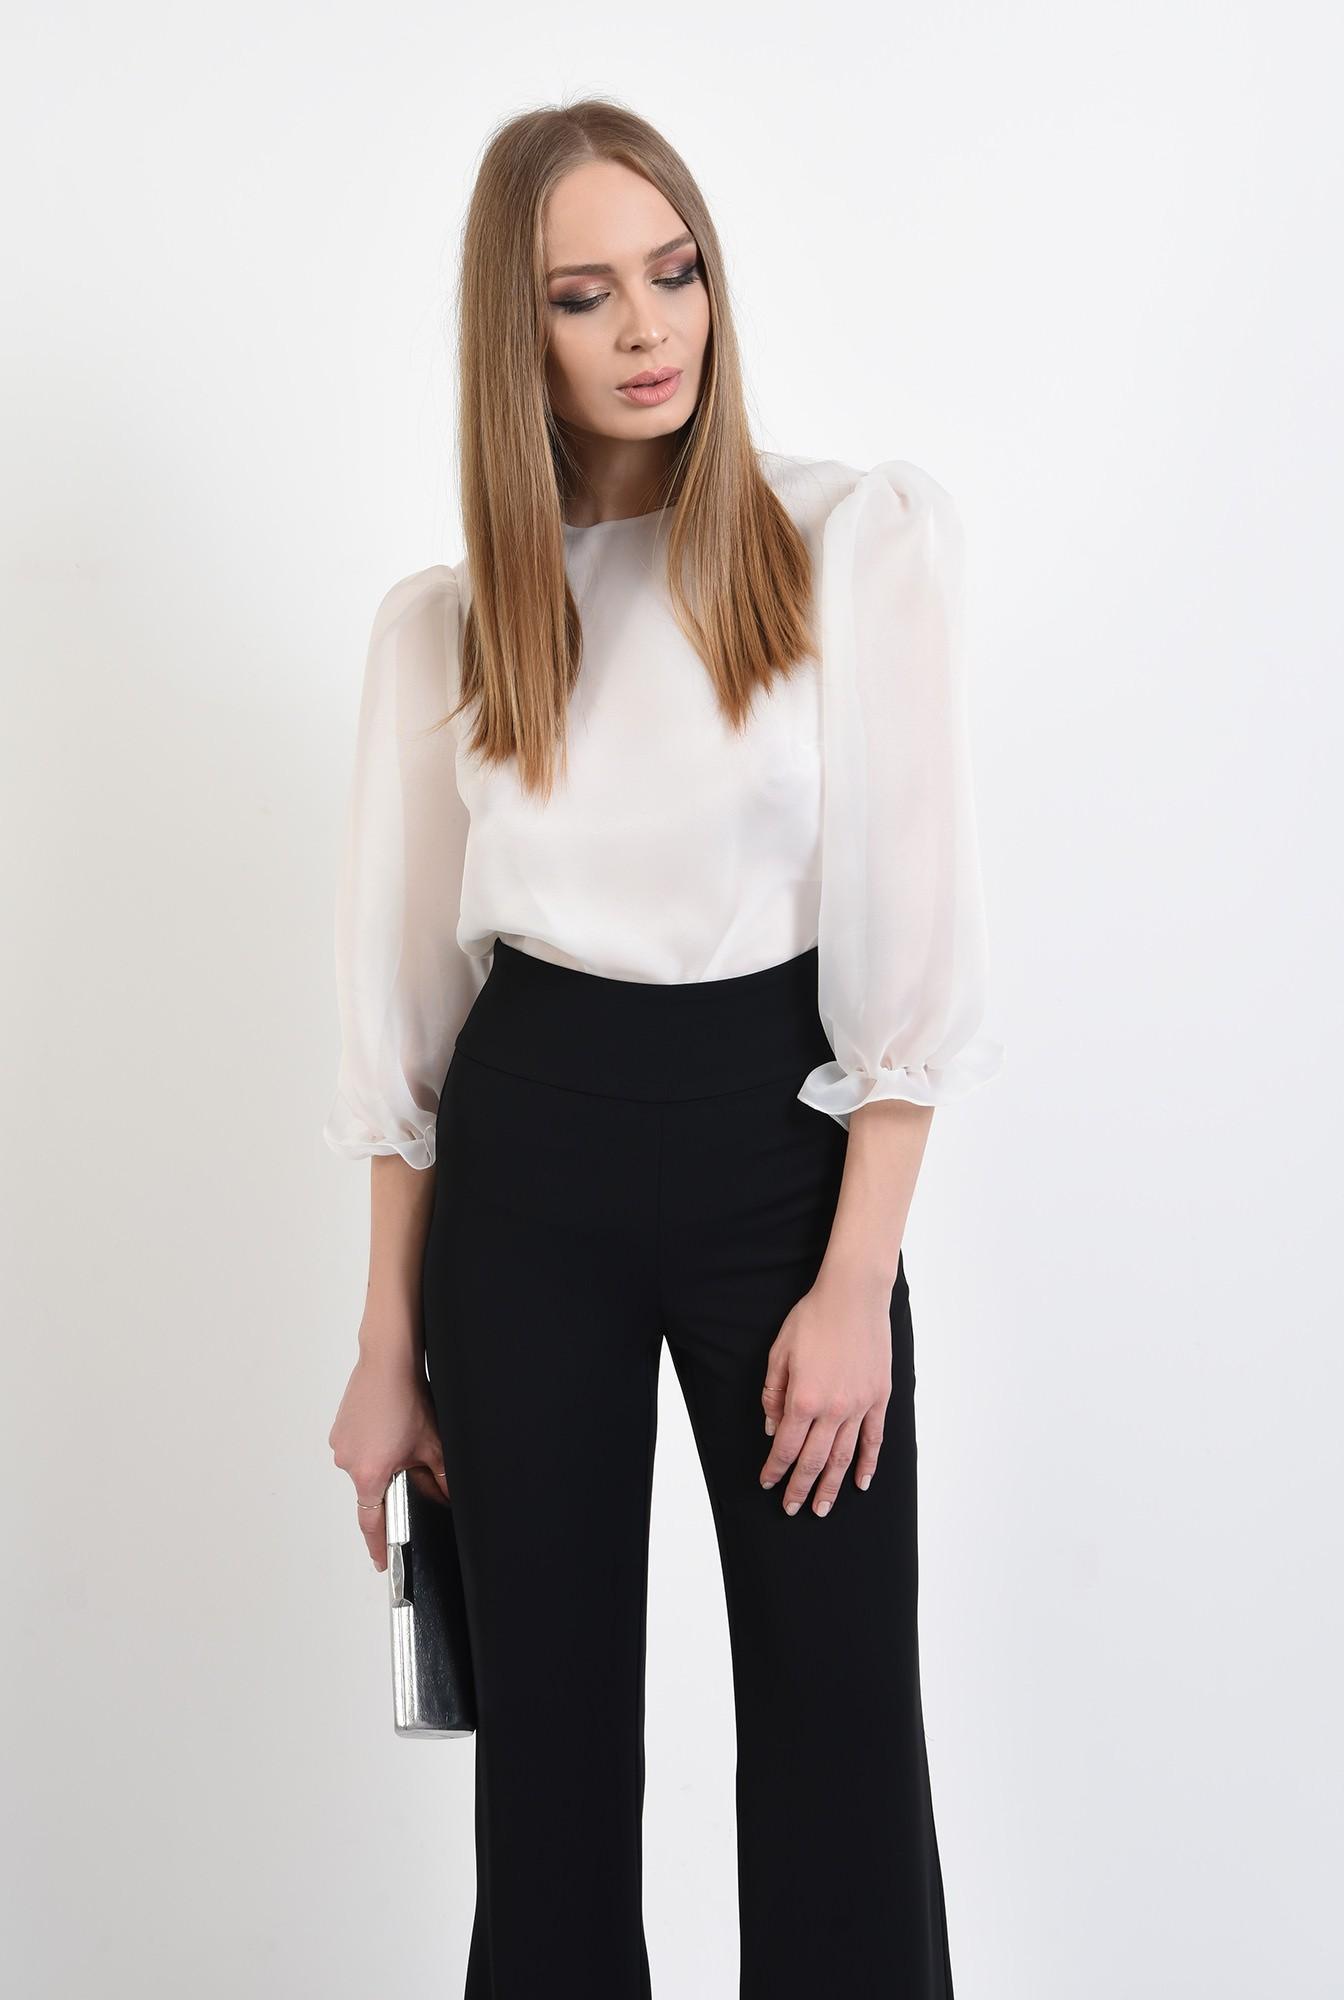 0 - 360 - bluza eleganta, de ocazie, din organza, cu maneci bufante, mansete volan